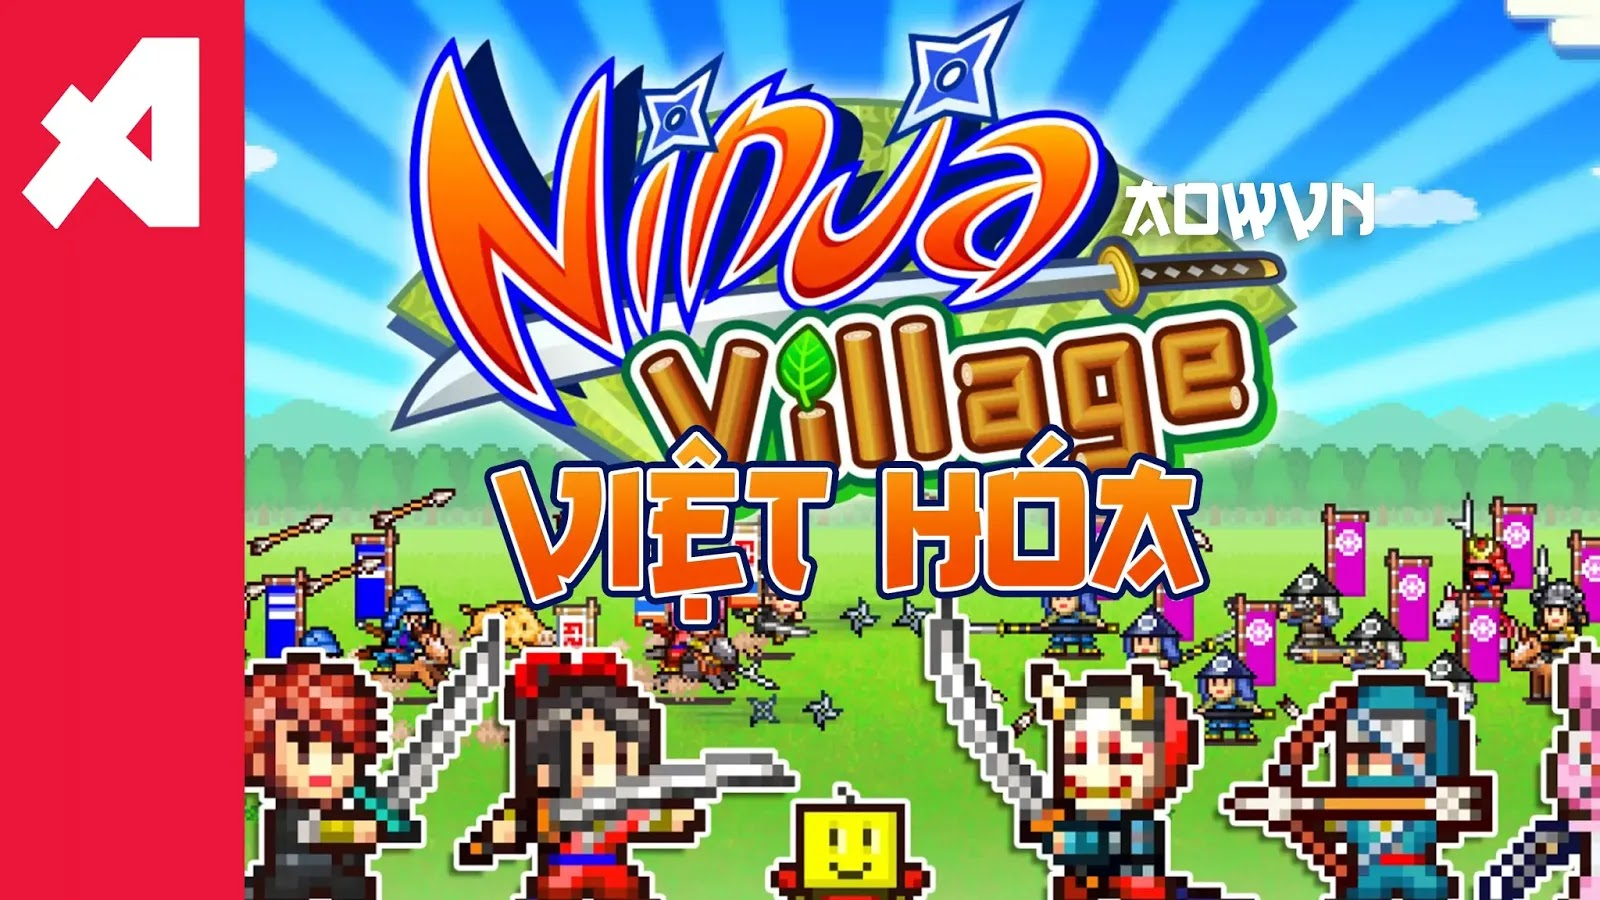 https://1.bp.blogspot.com/-3FfnbECI8VM/XUHNQry8mLI/AAAAAAAAo6U/T7MURclMHtkx2wCKWE4fVLga3Ww-M6ujgCLcBGAs/s1600/game-ninja-village-android-viet-hoa-aowvn%2B%25282%2529.webp